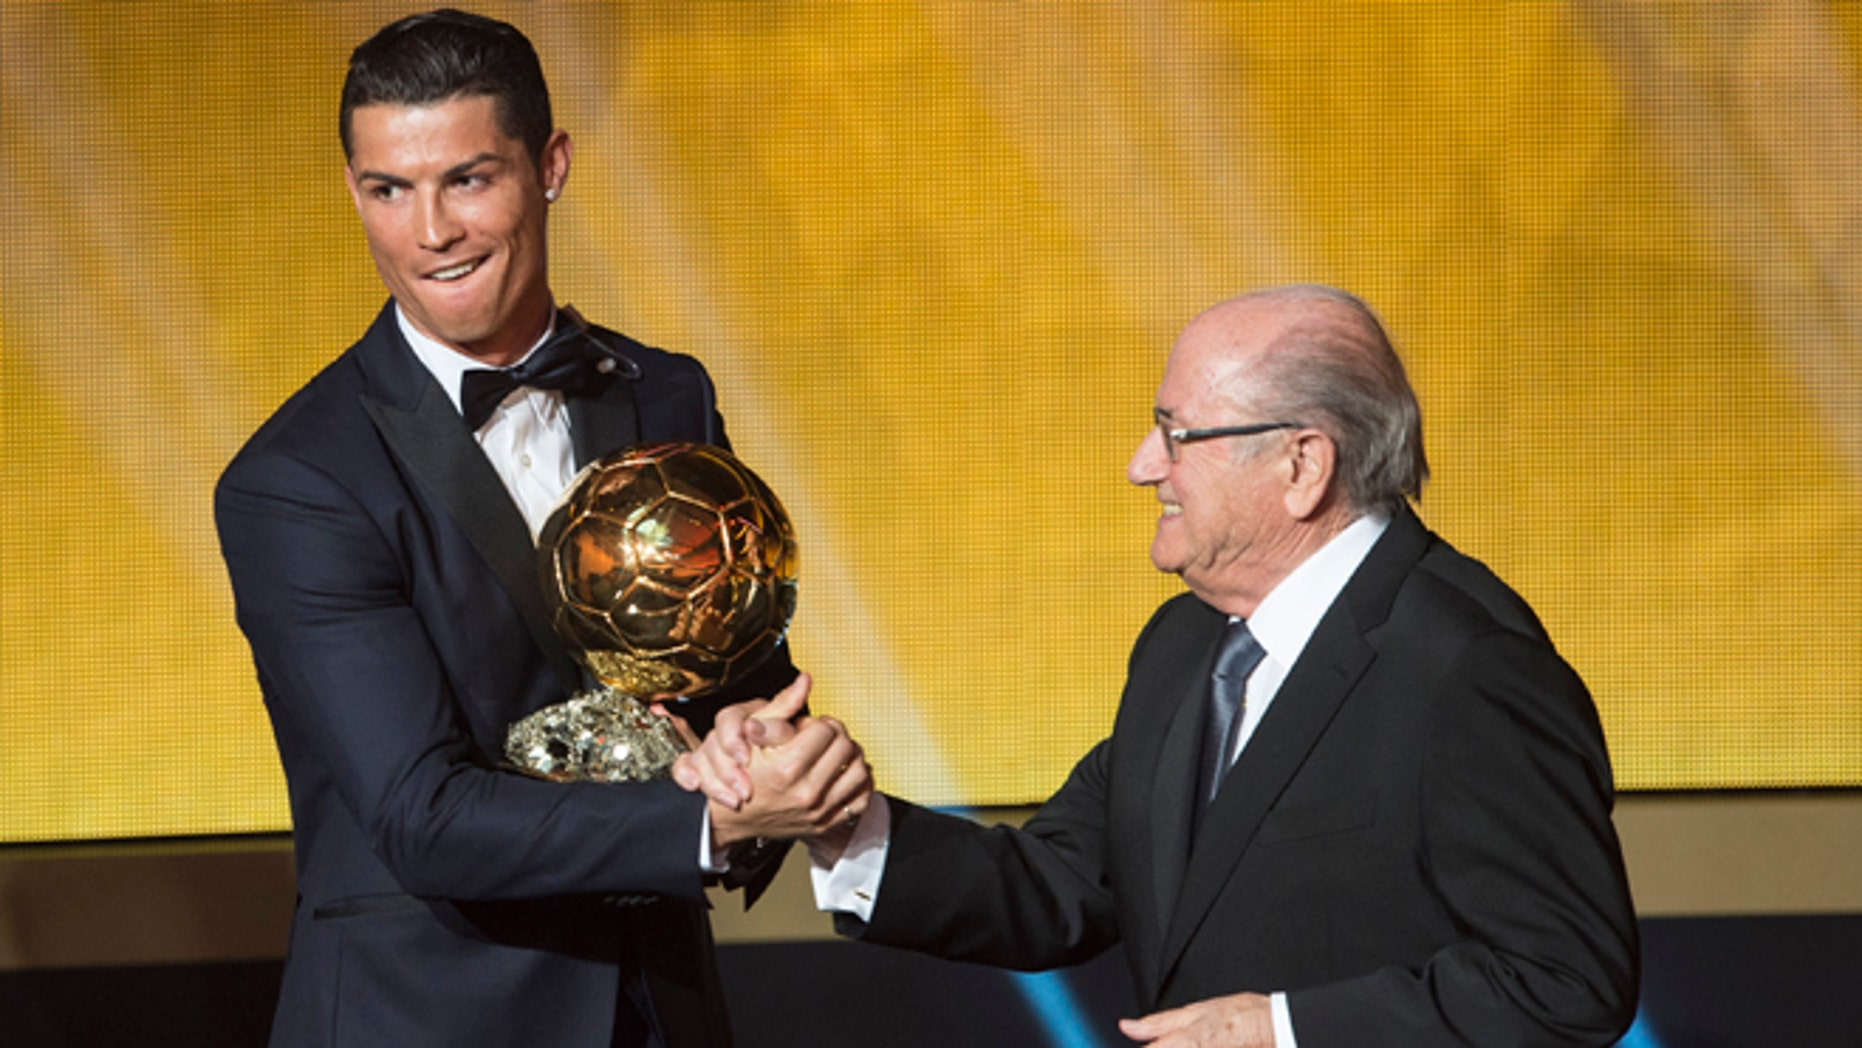 Cristiano Ronaldo congratulated by FIFA President Joseph Blatter the 2014 prize at the FIFA Ballon d'Or.